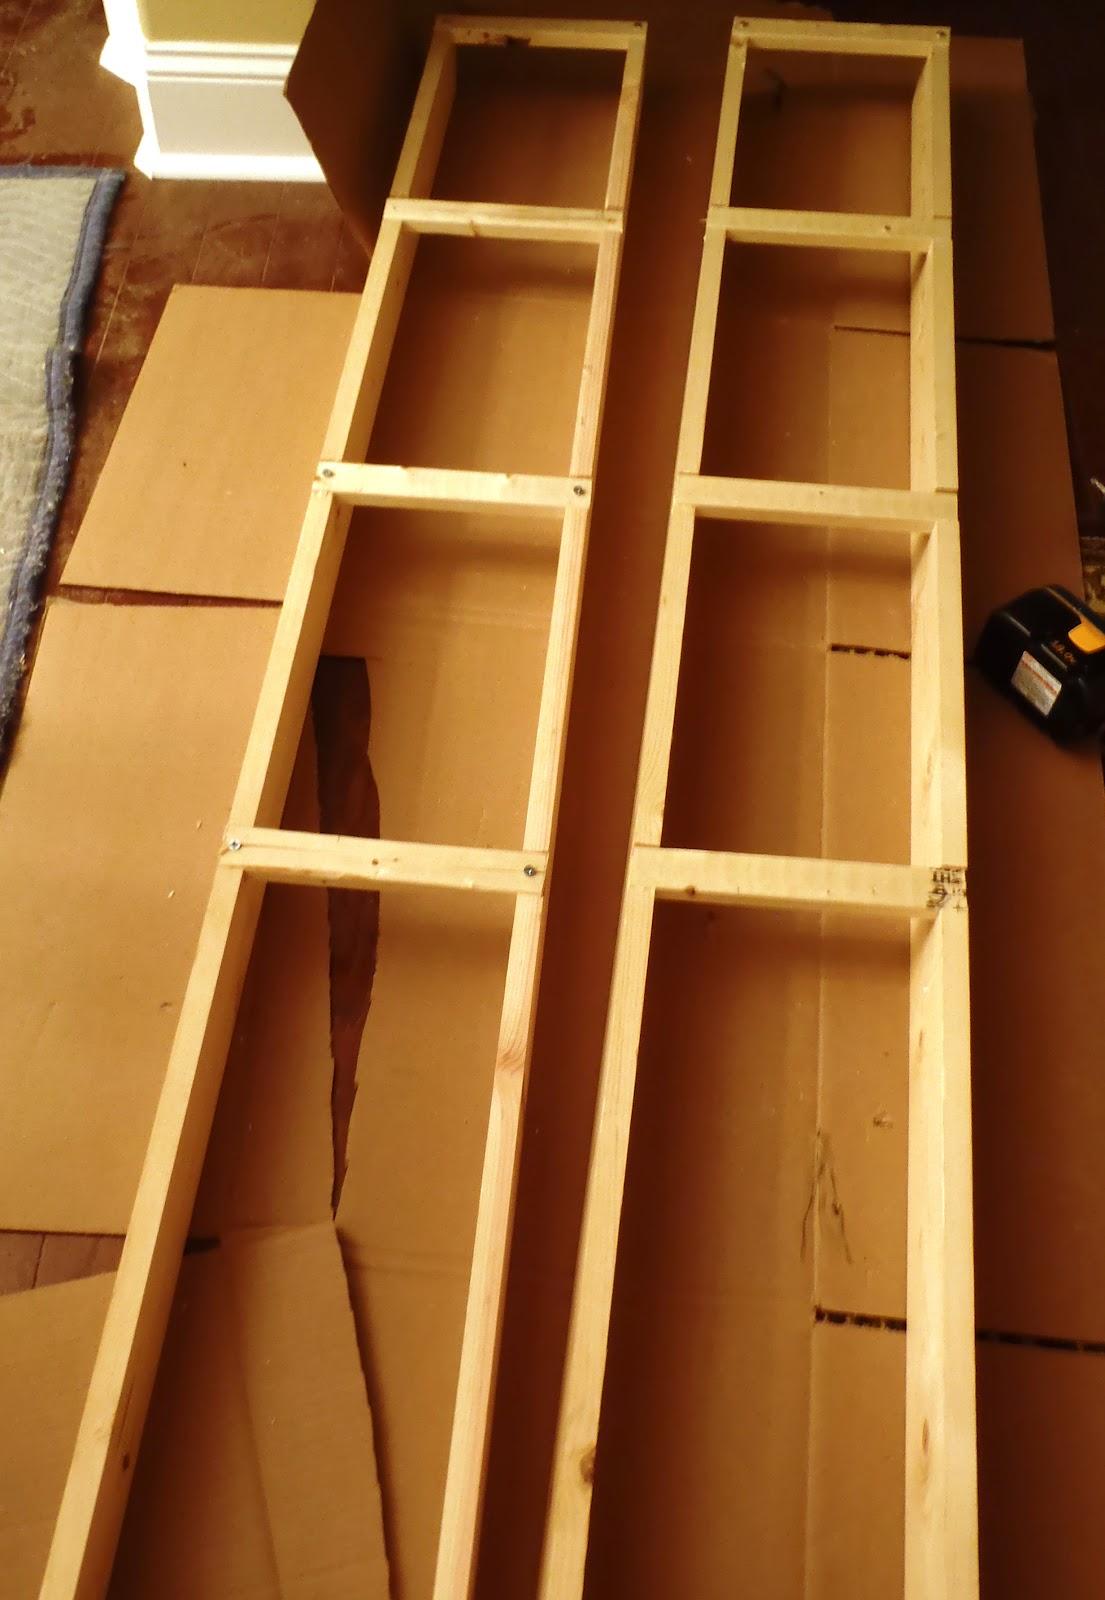 interiors furniture & design: laundry room shelves